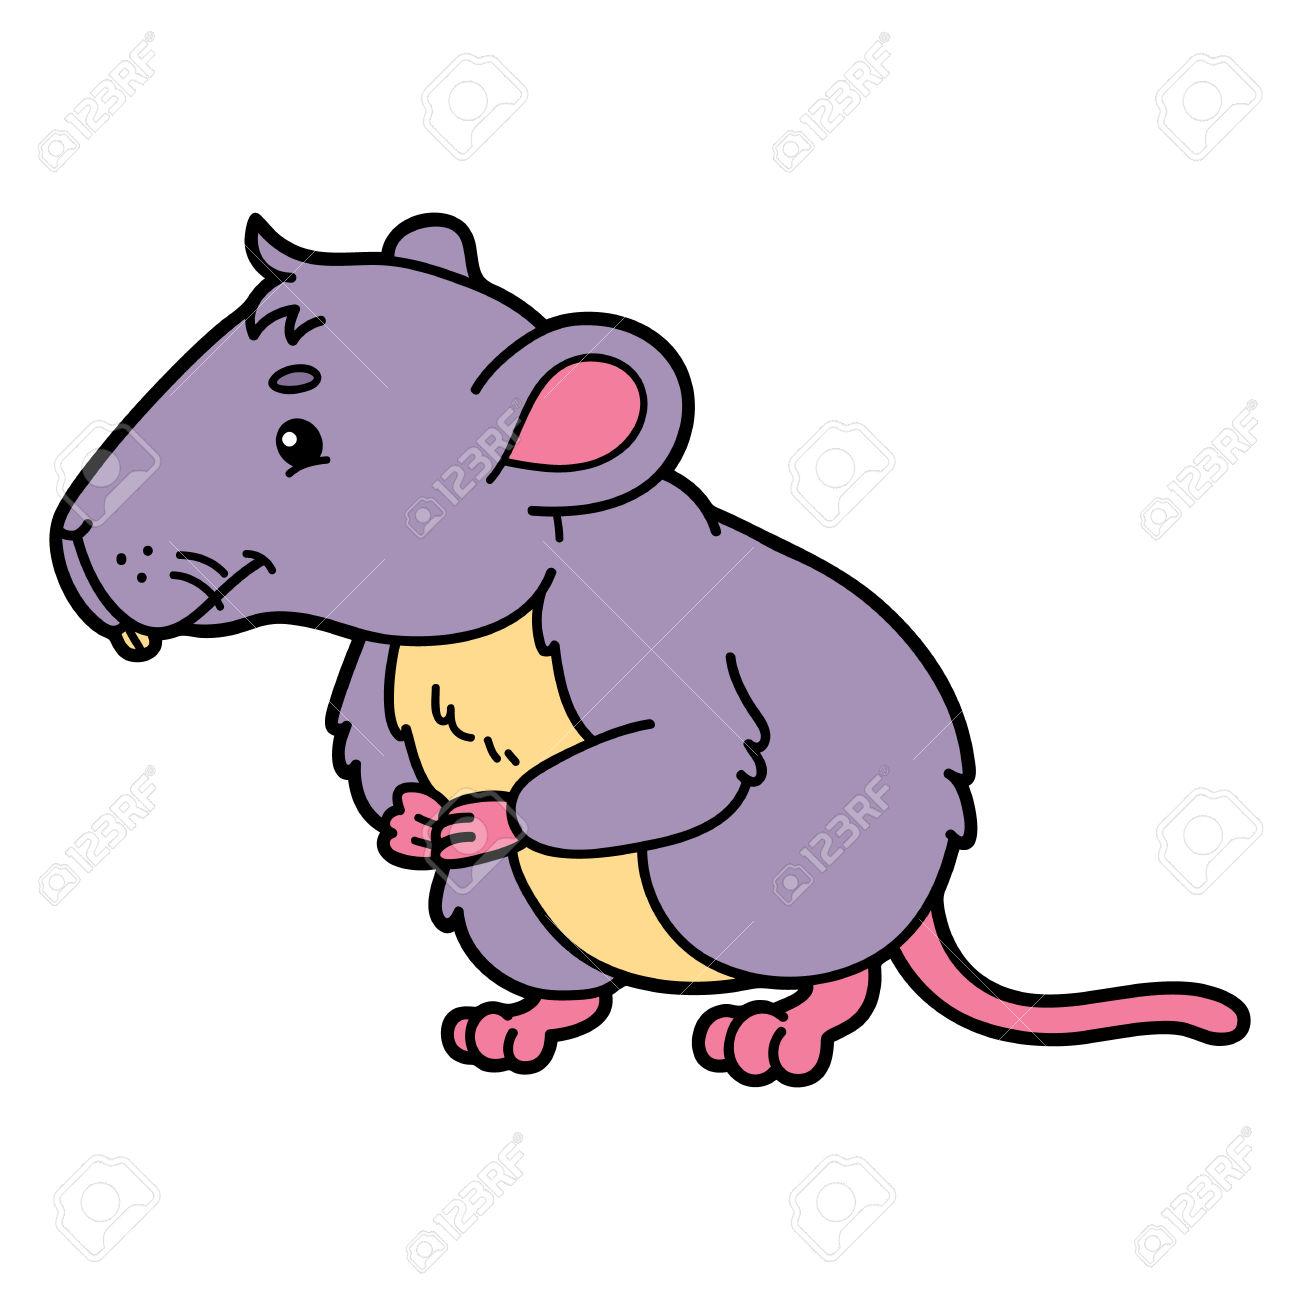 Cute free download best. Rat clipart vole